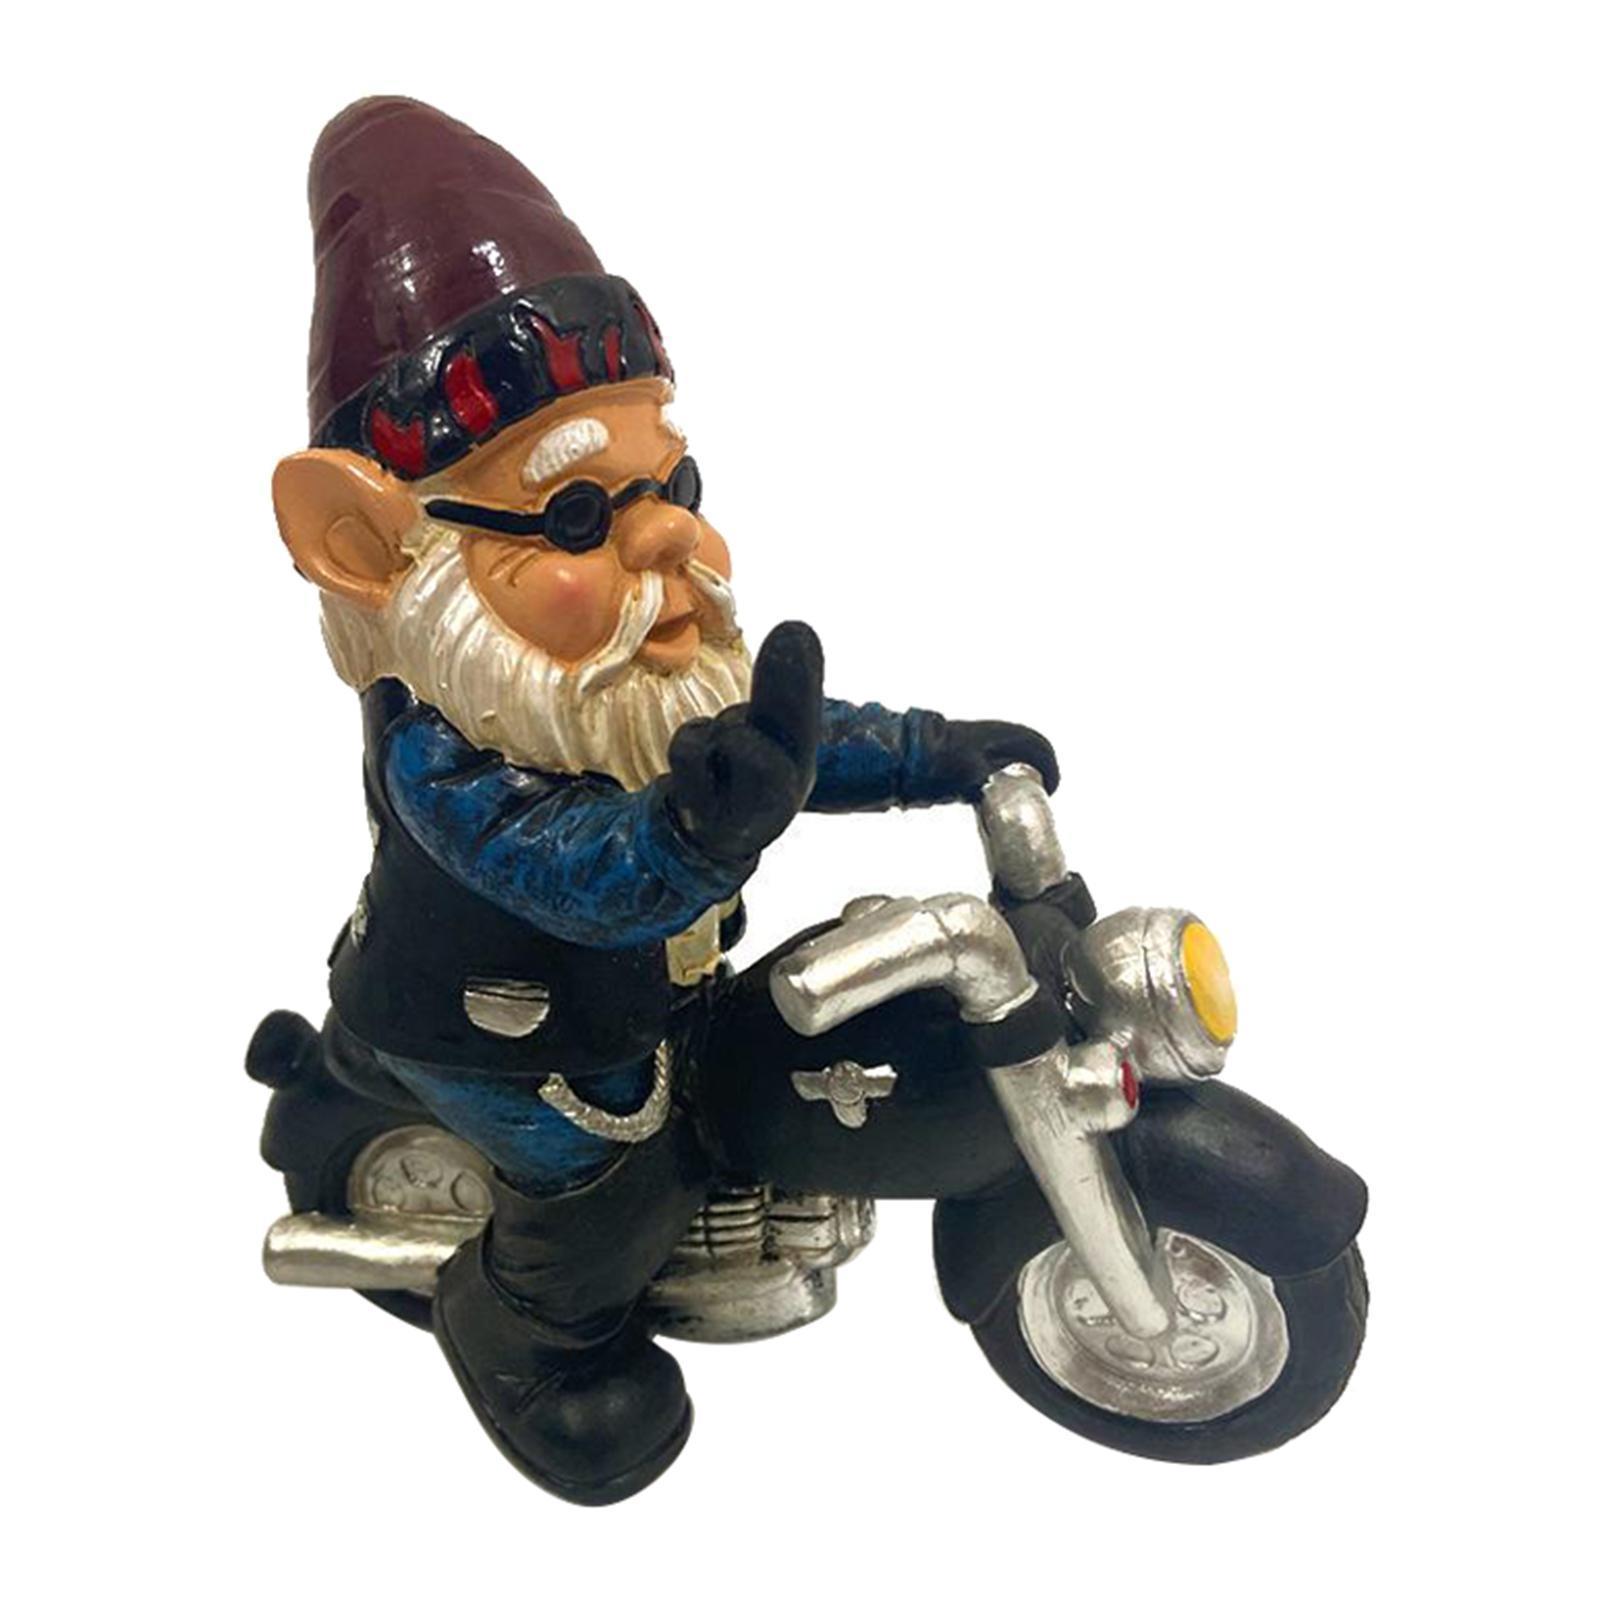 thumbnail 24 - Funny Resin Naughty Garden Gnome Statue Ornaments Villa Home Figurines Decor